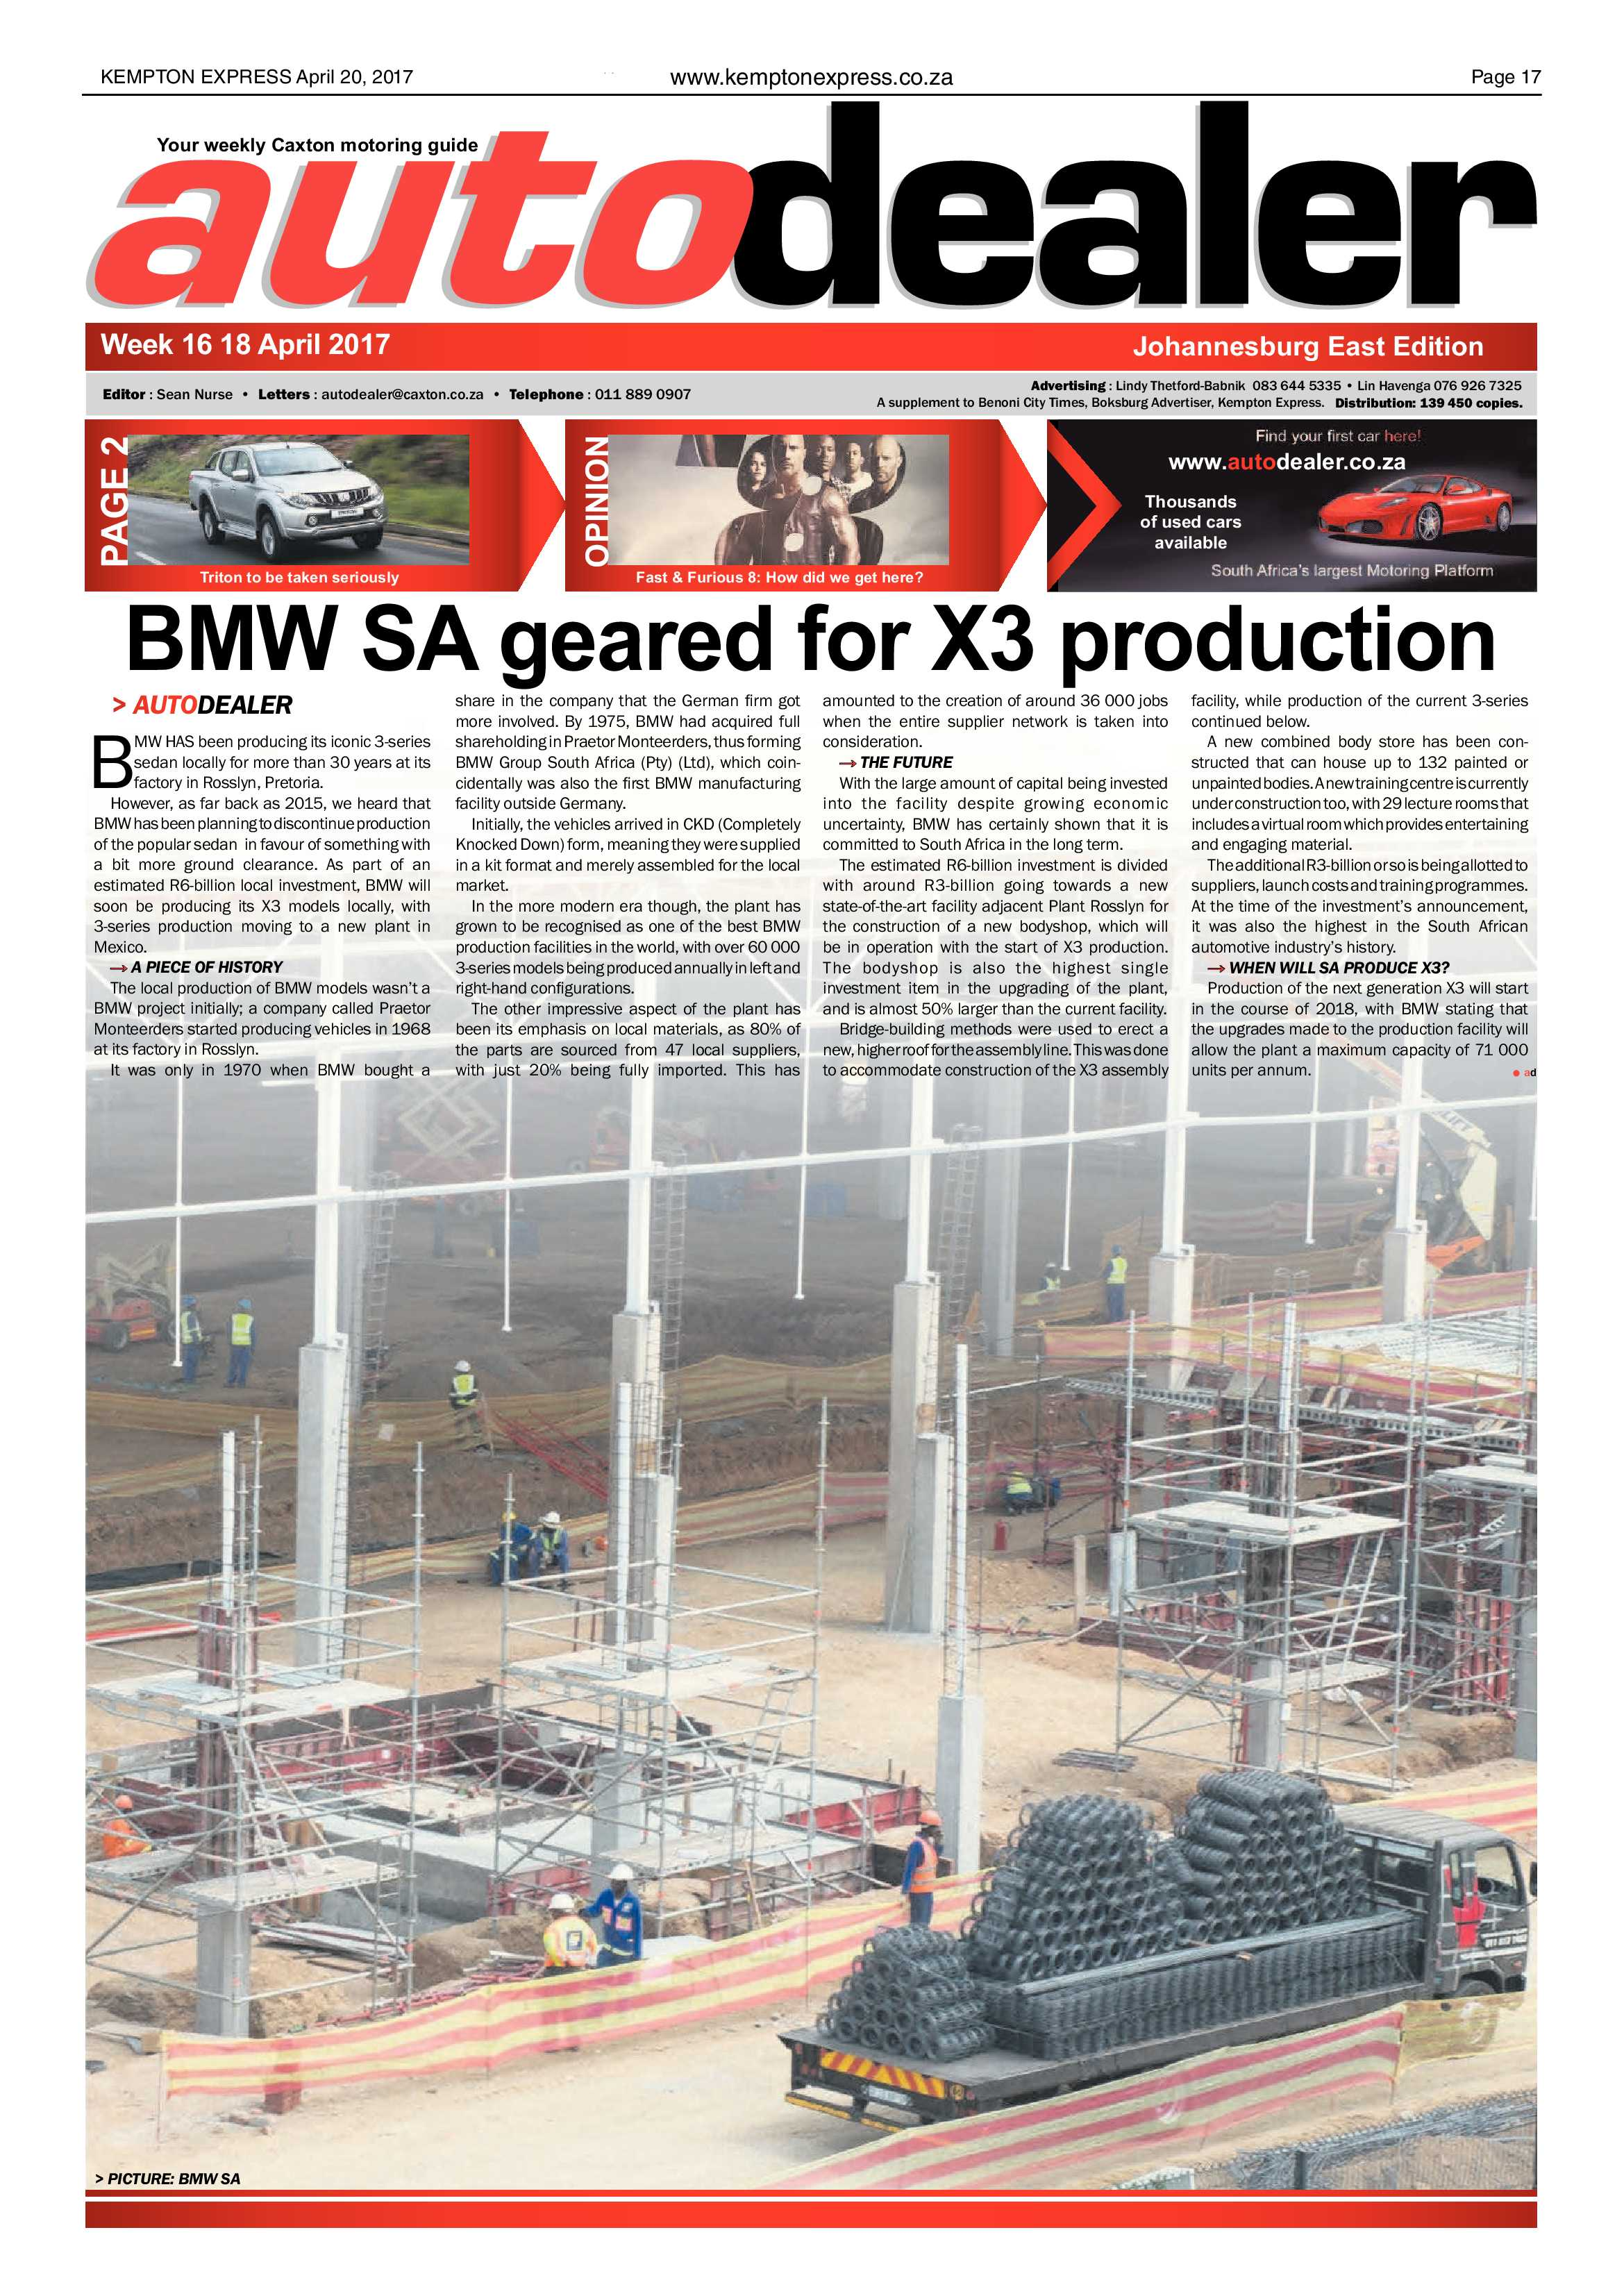 kempton-express-20-april-2017-epapers-page-17